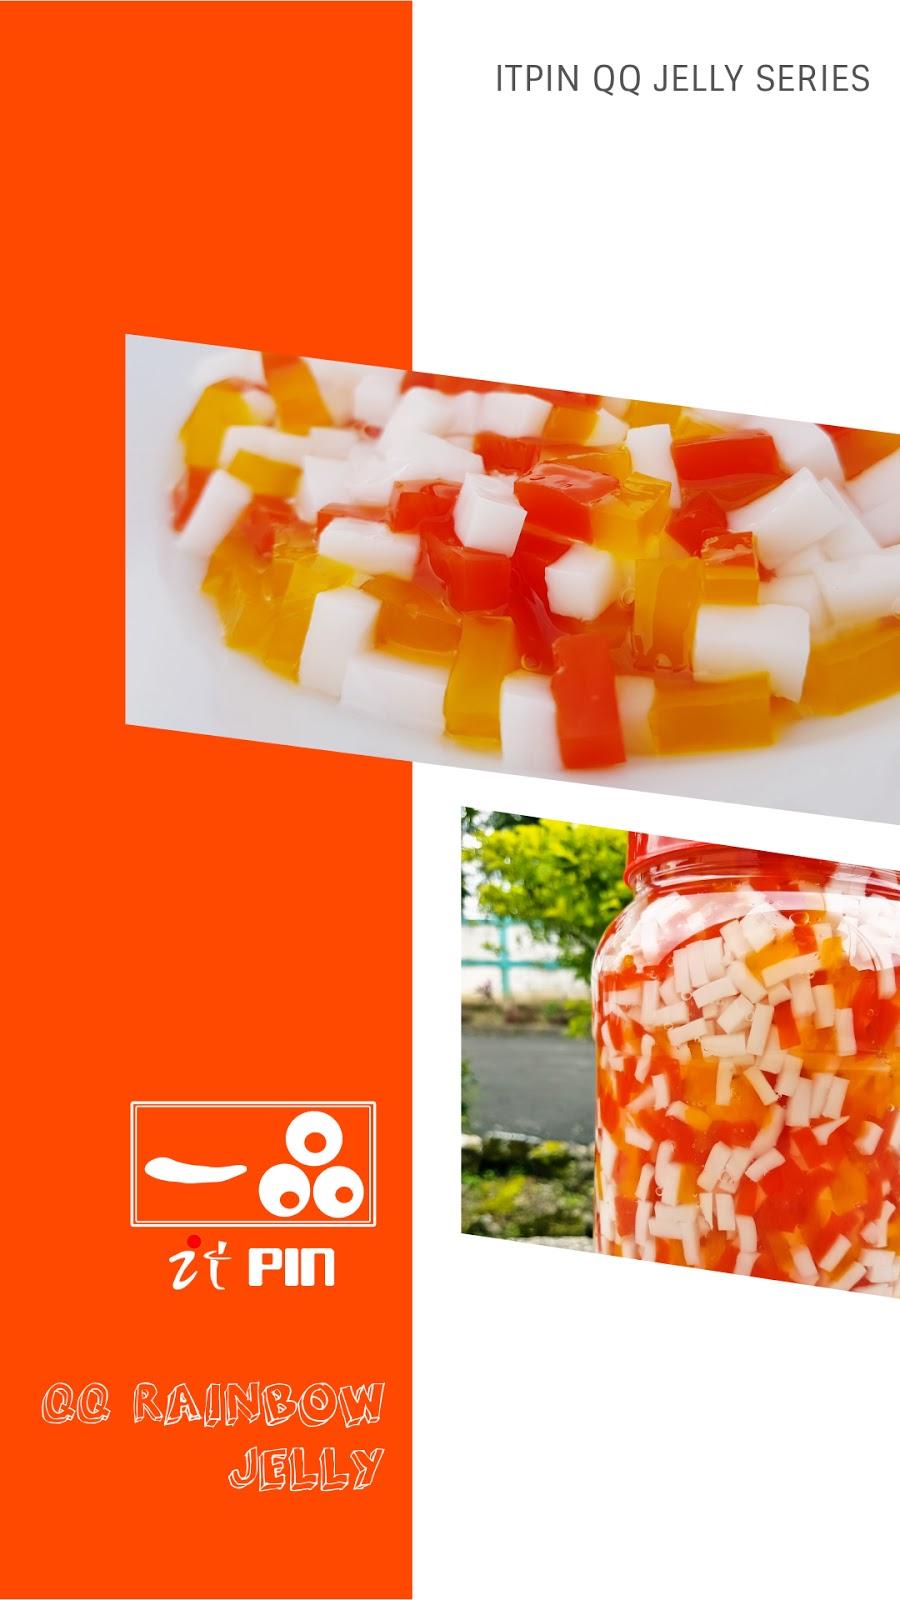 Qq Rainbow Jelly